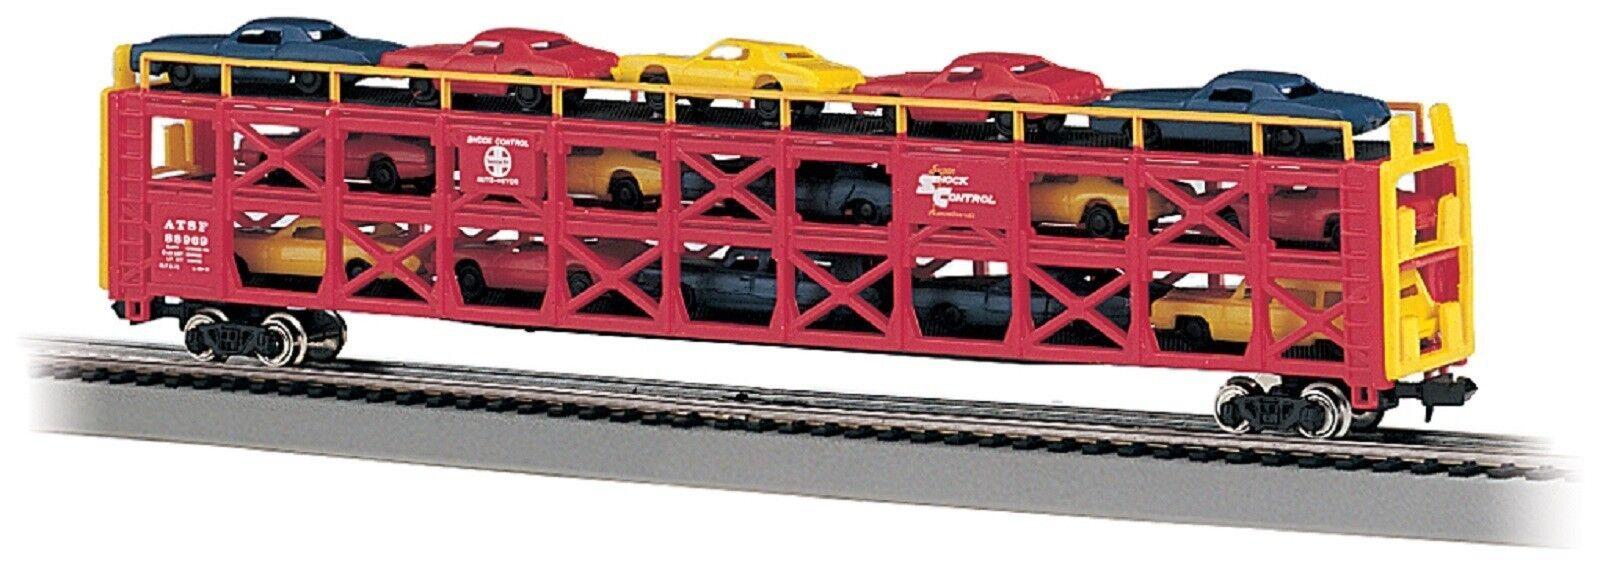 punto de venta 46502 Wagon porte autos 3 niveaux Santa FE FE FE avec voitures Bachmann train N 1 160  soporte minorista mayorista